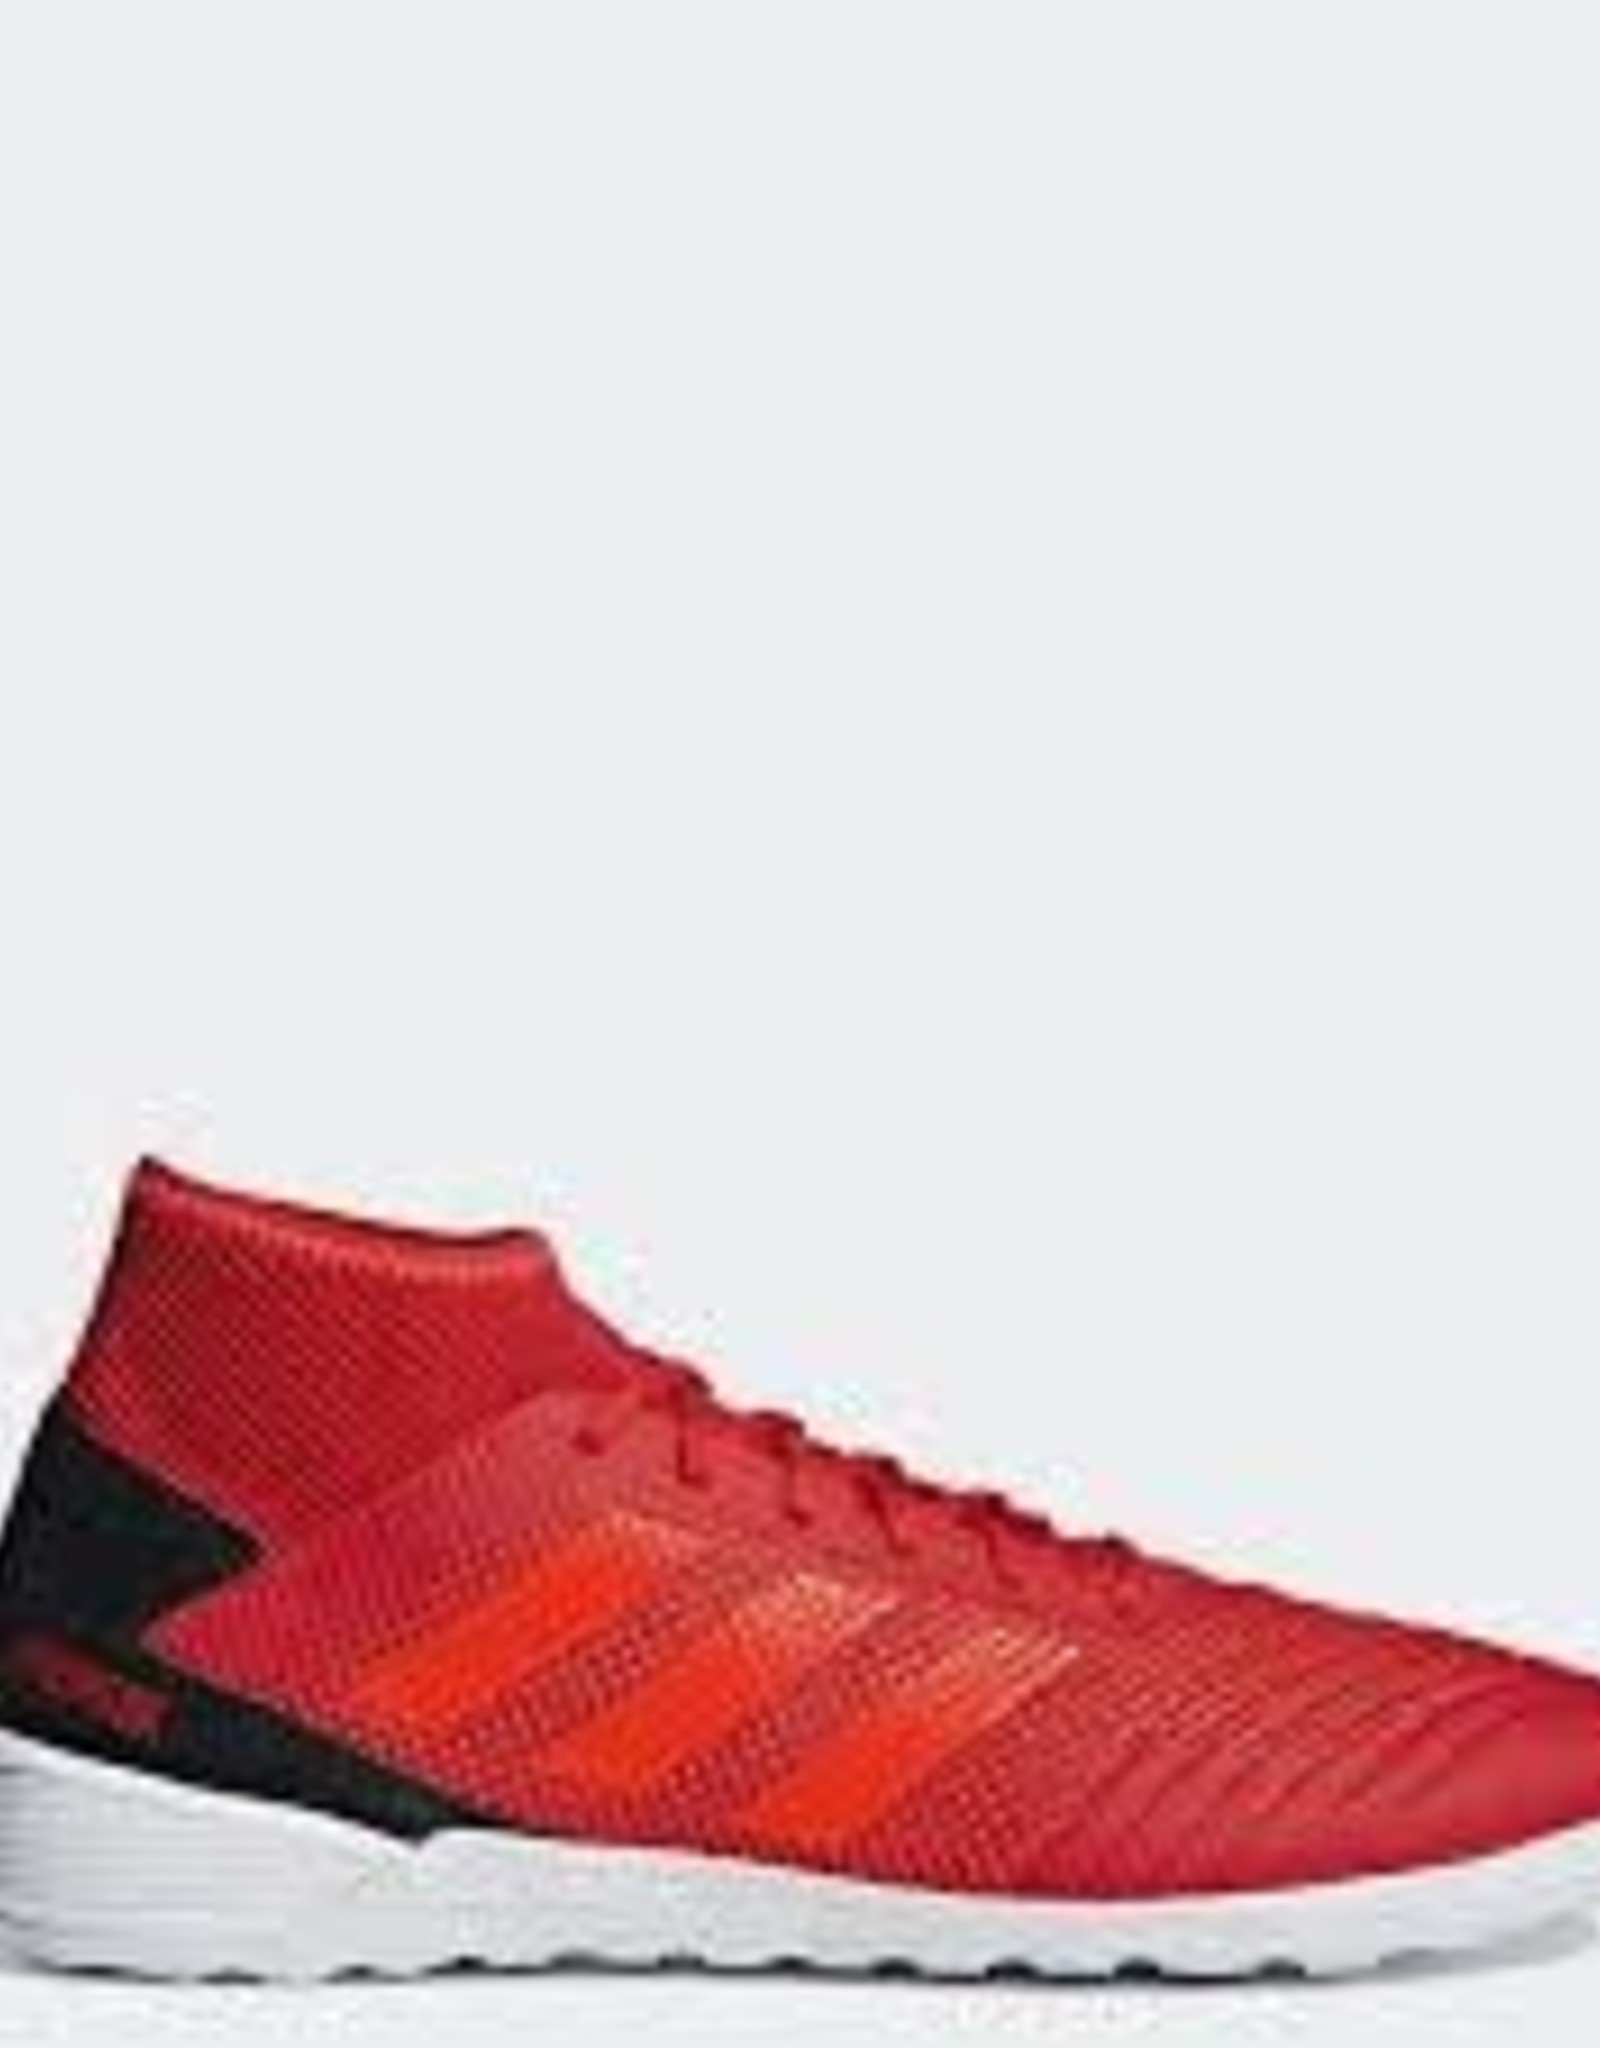 Adidas Adidas IN Predator 19.3